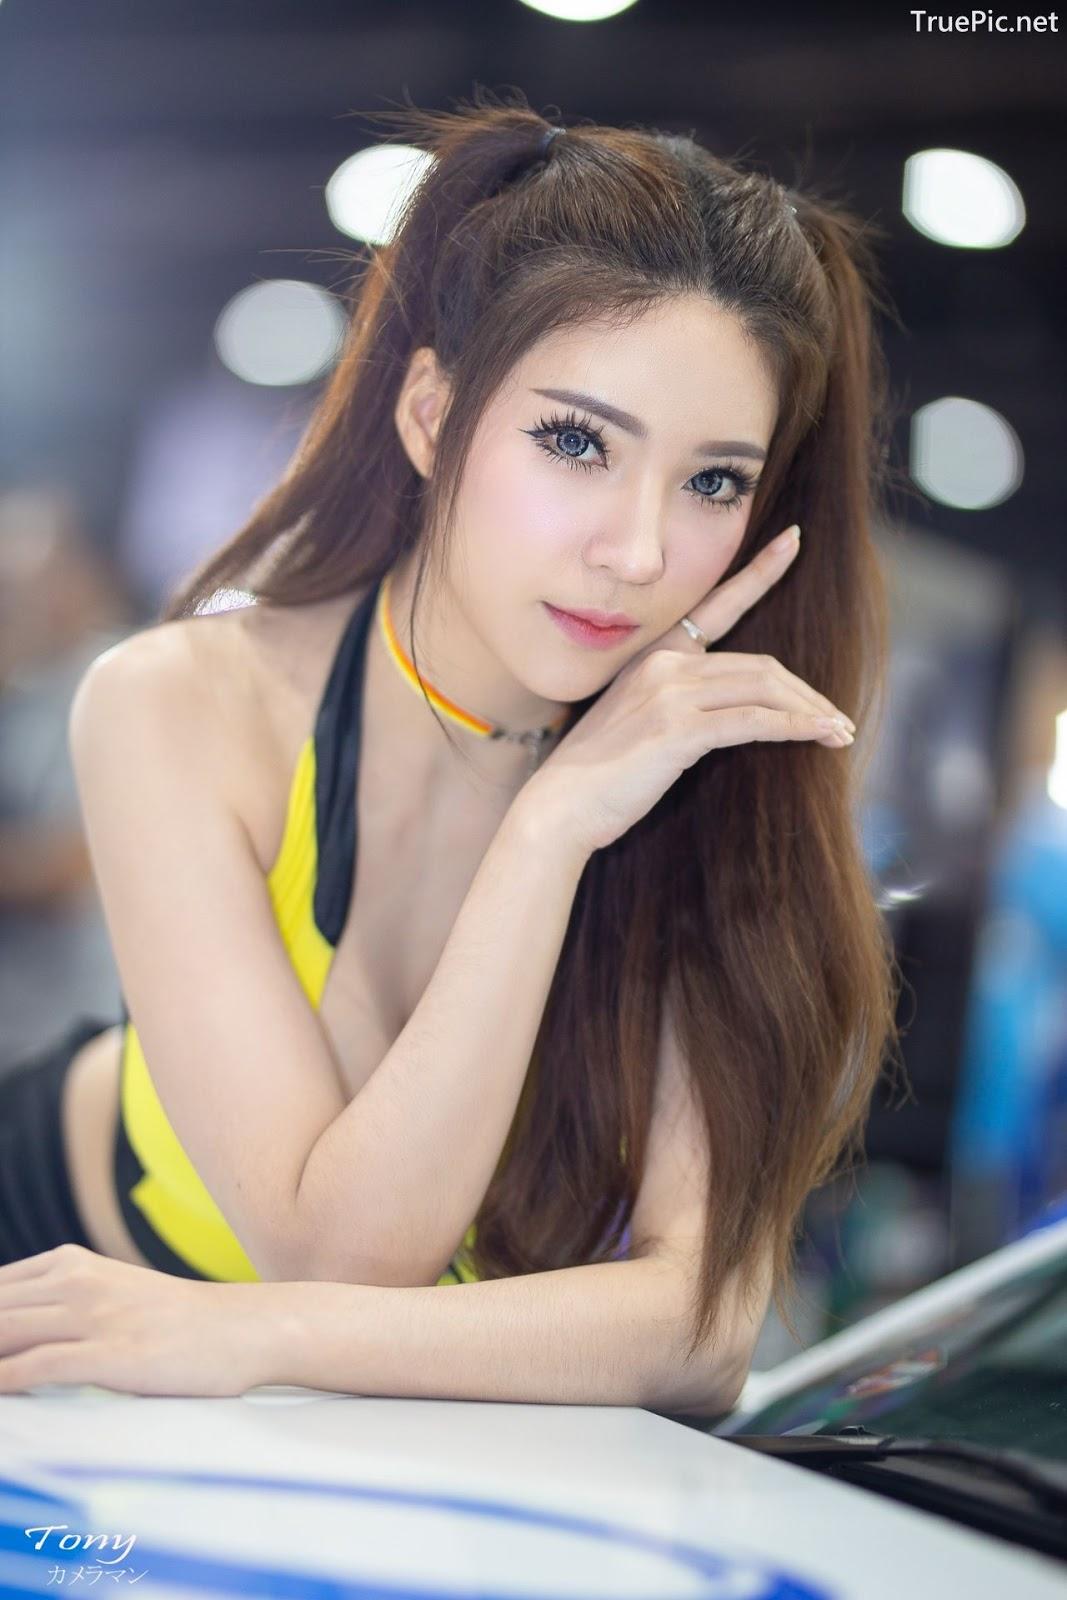 Image-Thailand-Hot-Model-Thai-Racing-Girl-At-Bangkok-Auto-Salon-2019-TruePic.net- Picture-1